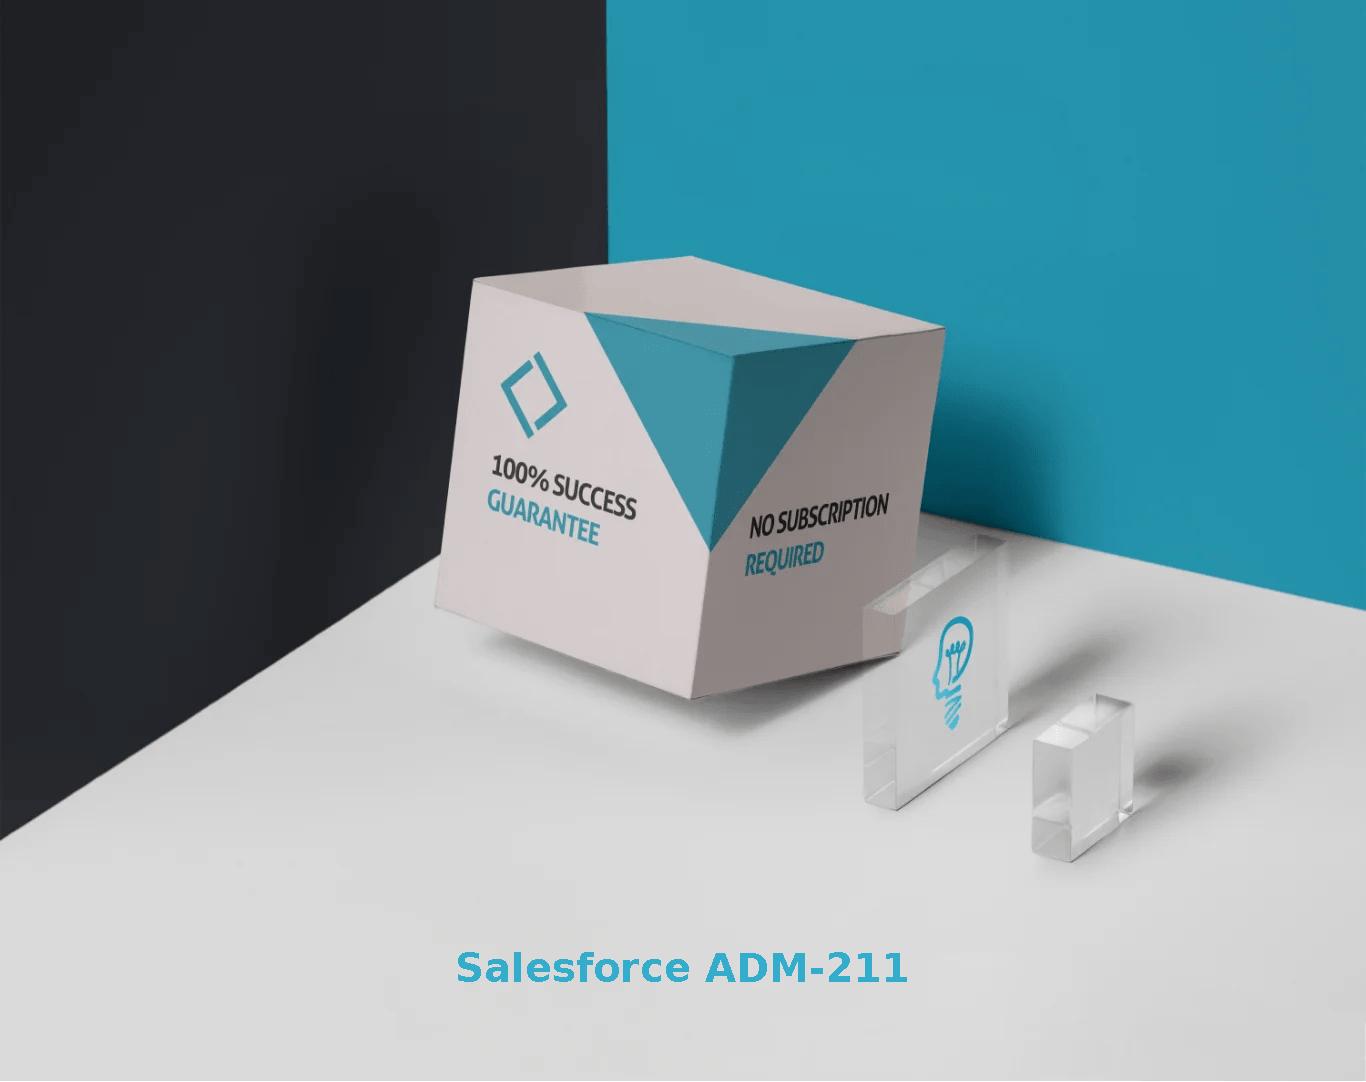 Salesforce ADM-211 Exams